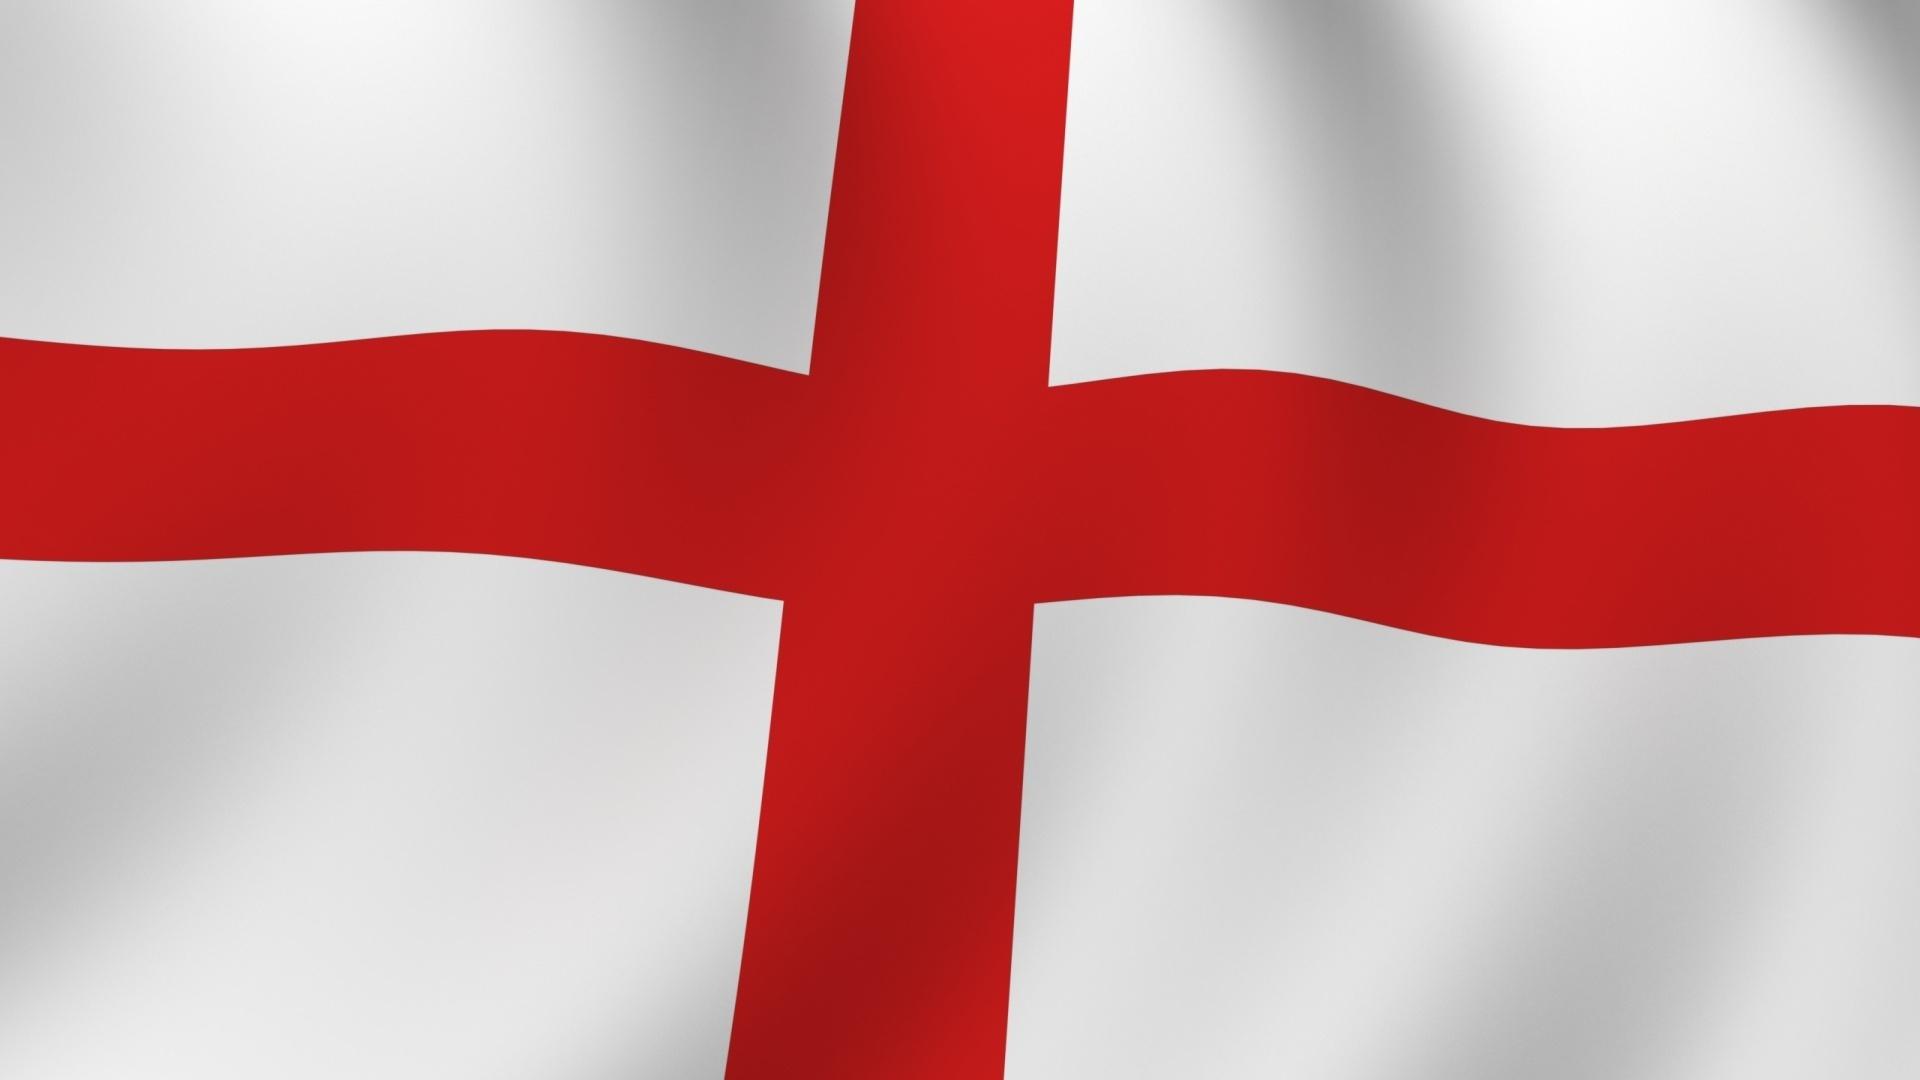 England flag wallpaper in 1920x1080 screen resolution 1920x1080